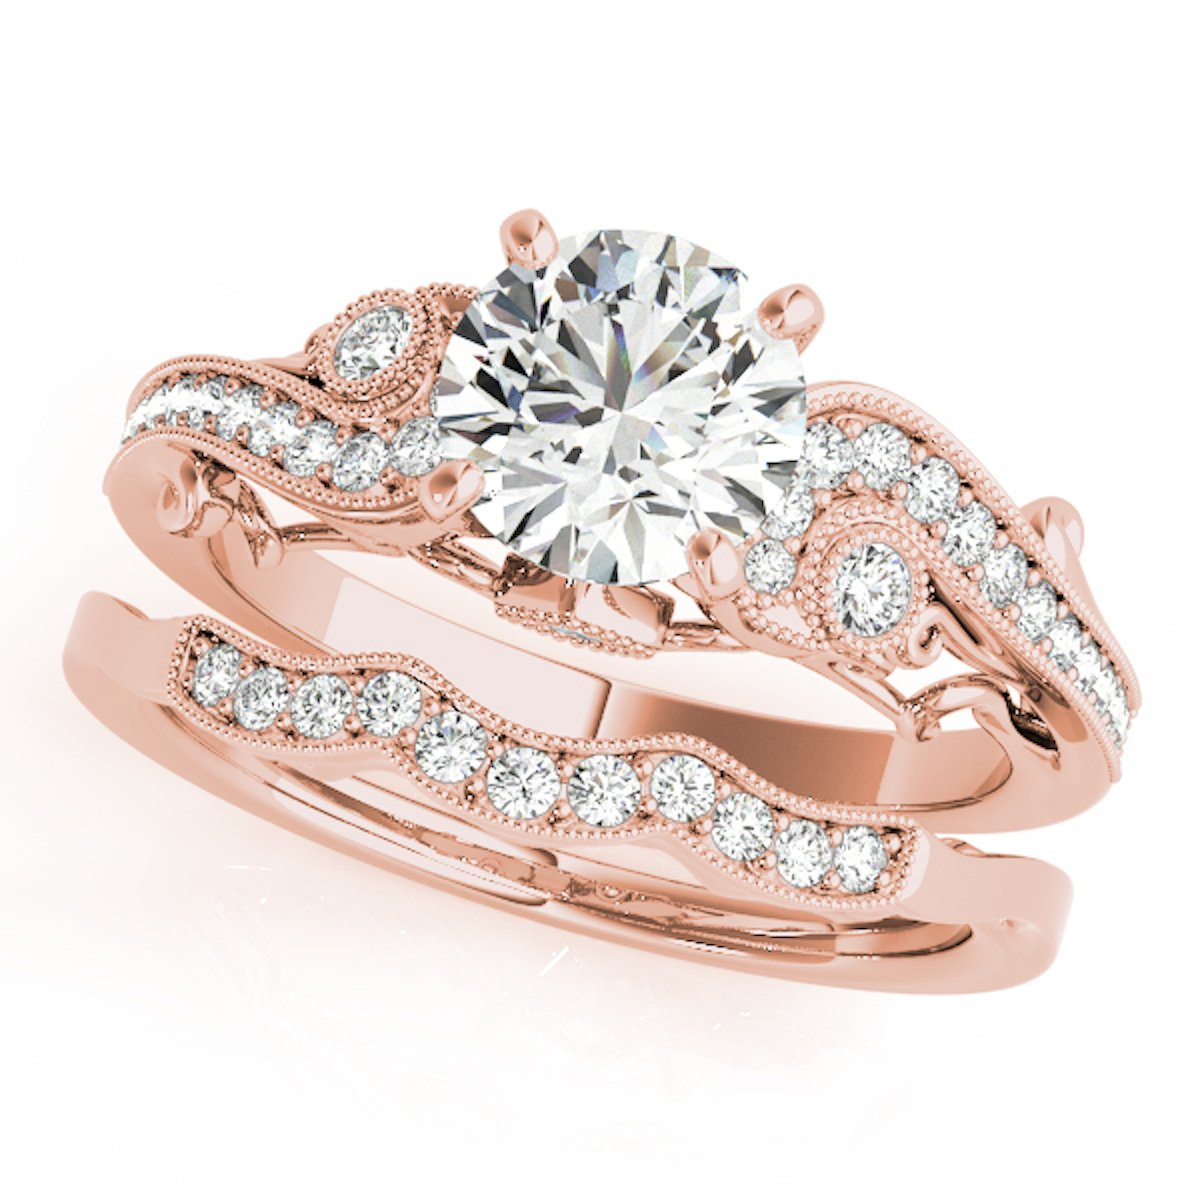 0.60 Ct. Diamond Engagement Bridal Ring Set 14K Solid Rose Gold